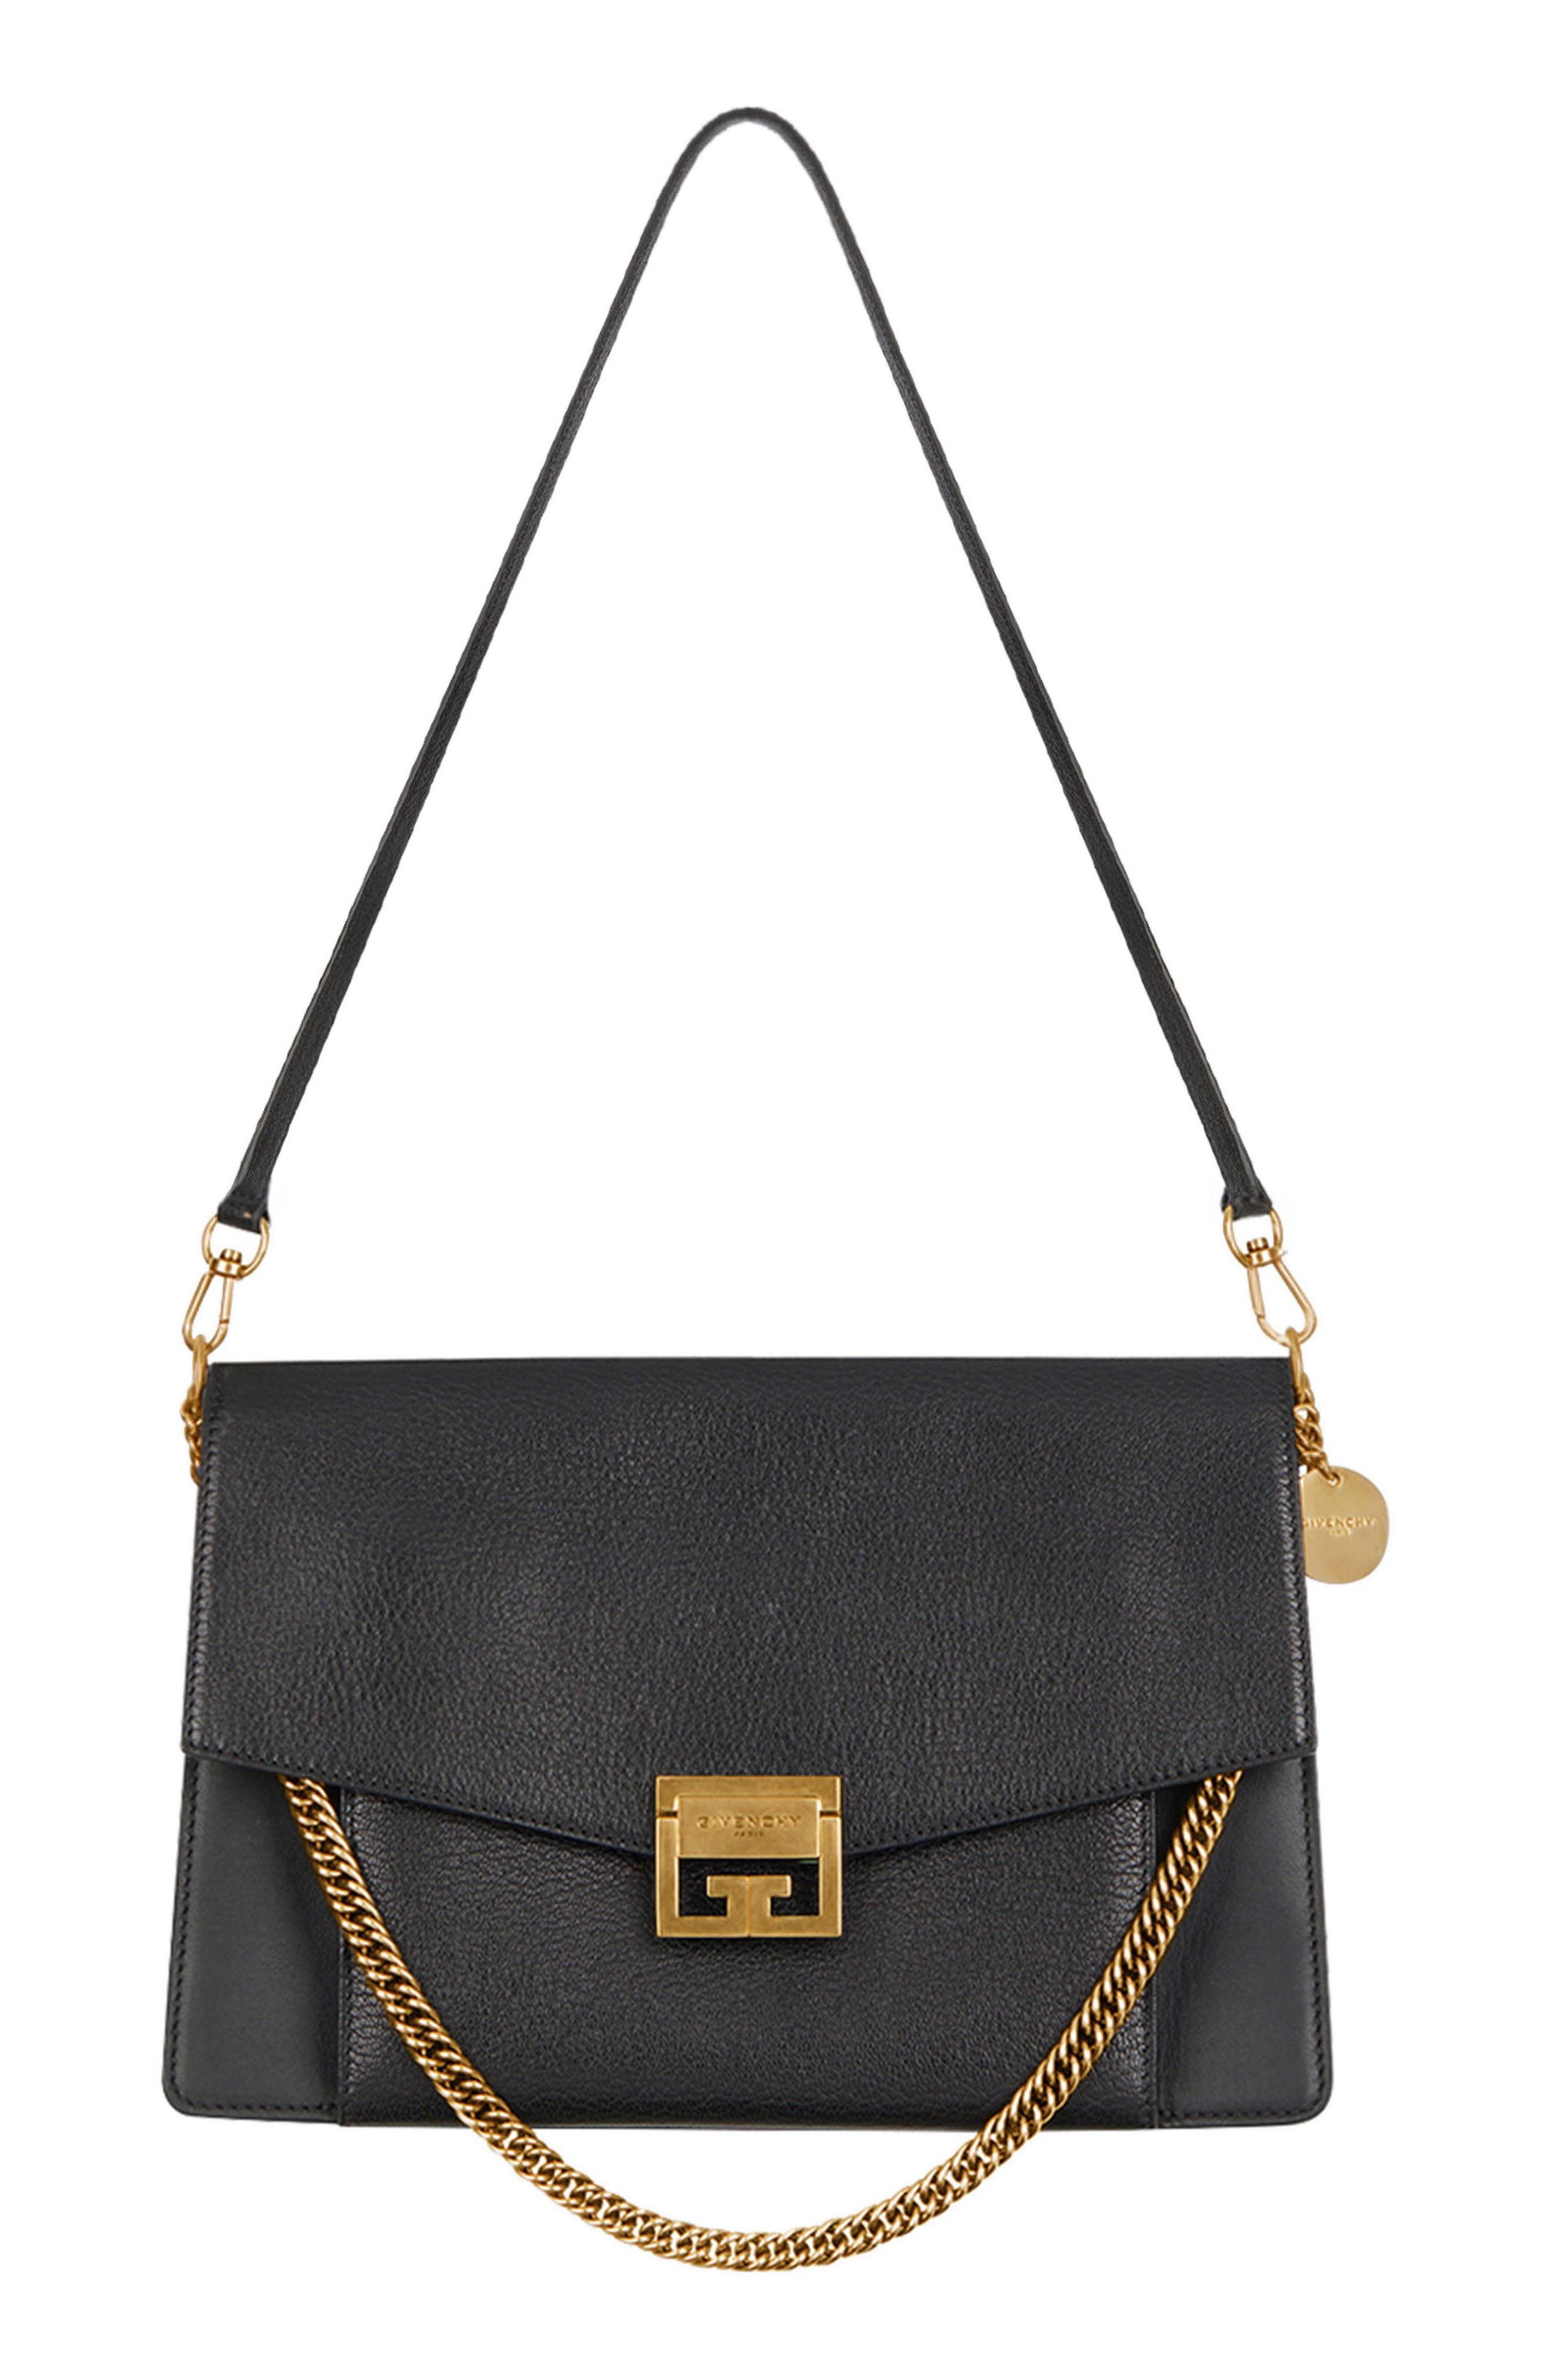 Medium GV3 Leather Crossbody Bag,                             Alternate thumbnail 8, color,                             BLACK/ GREY